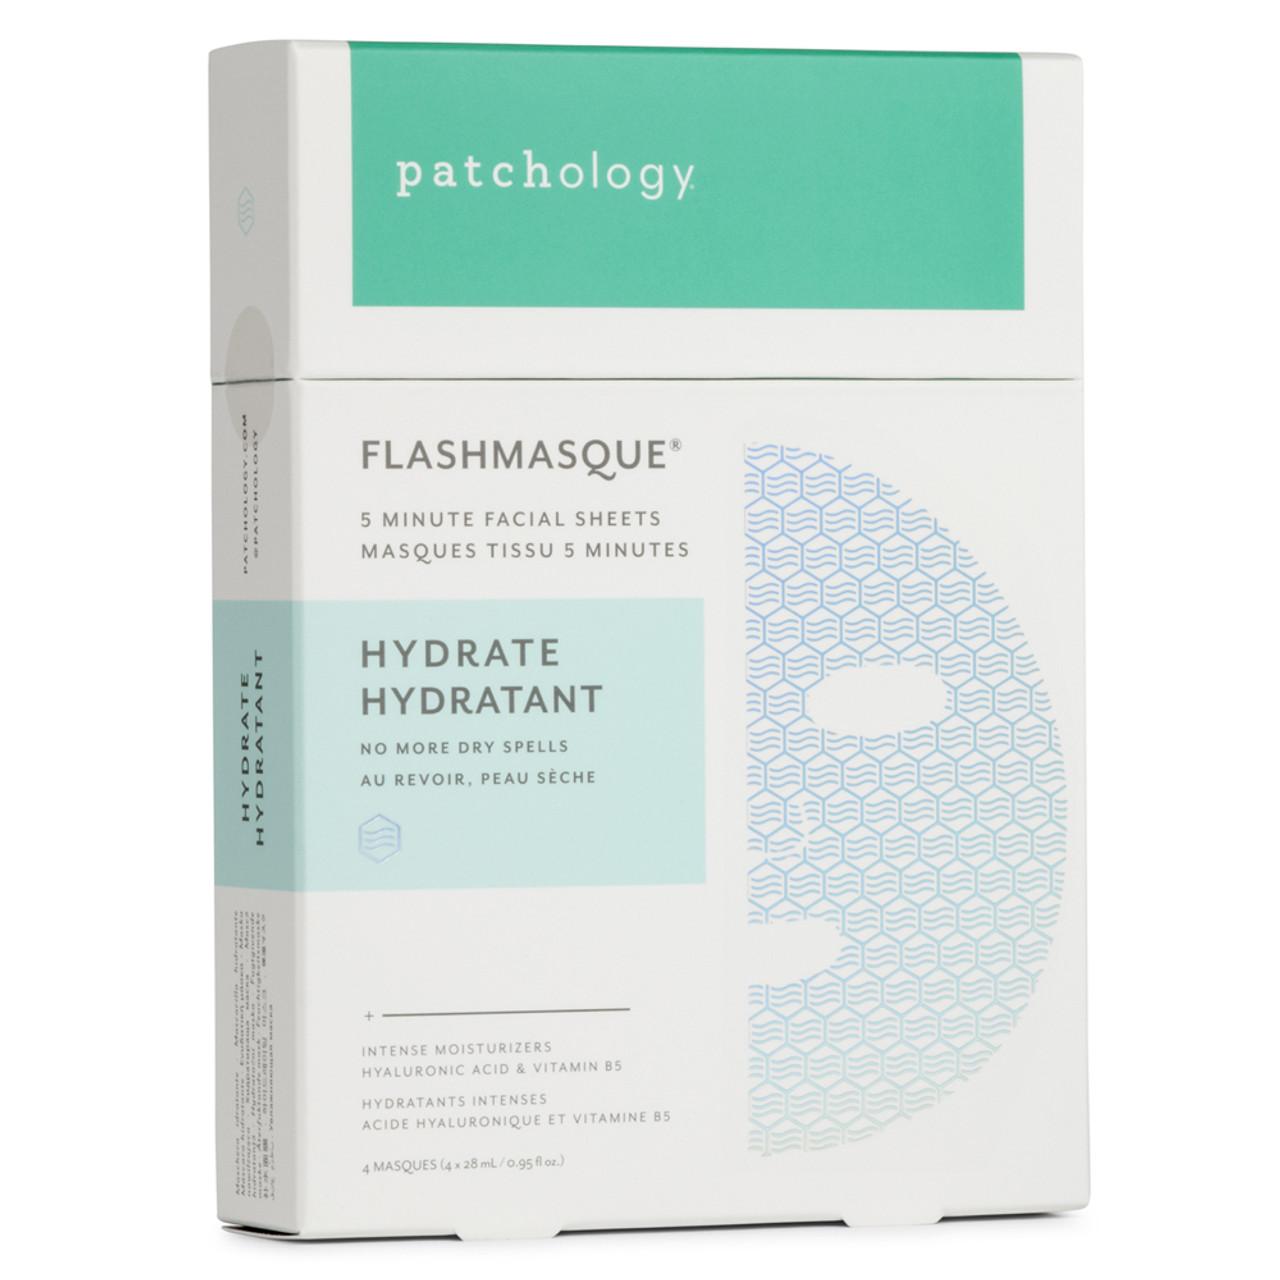 Patchology FlashMasque Hydrate (4-Pk)